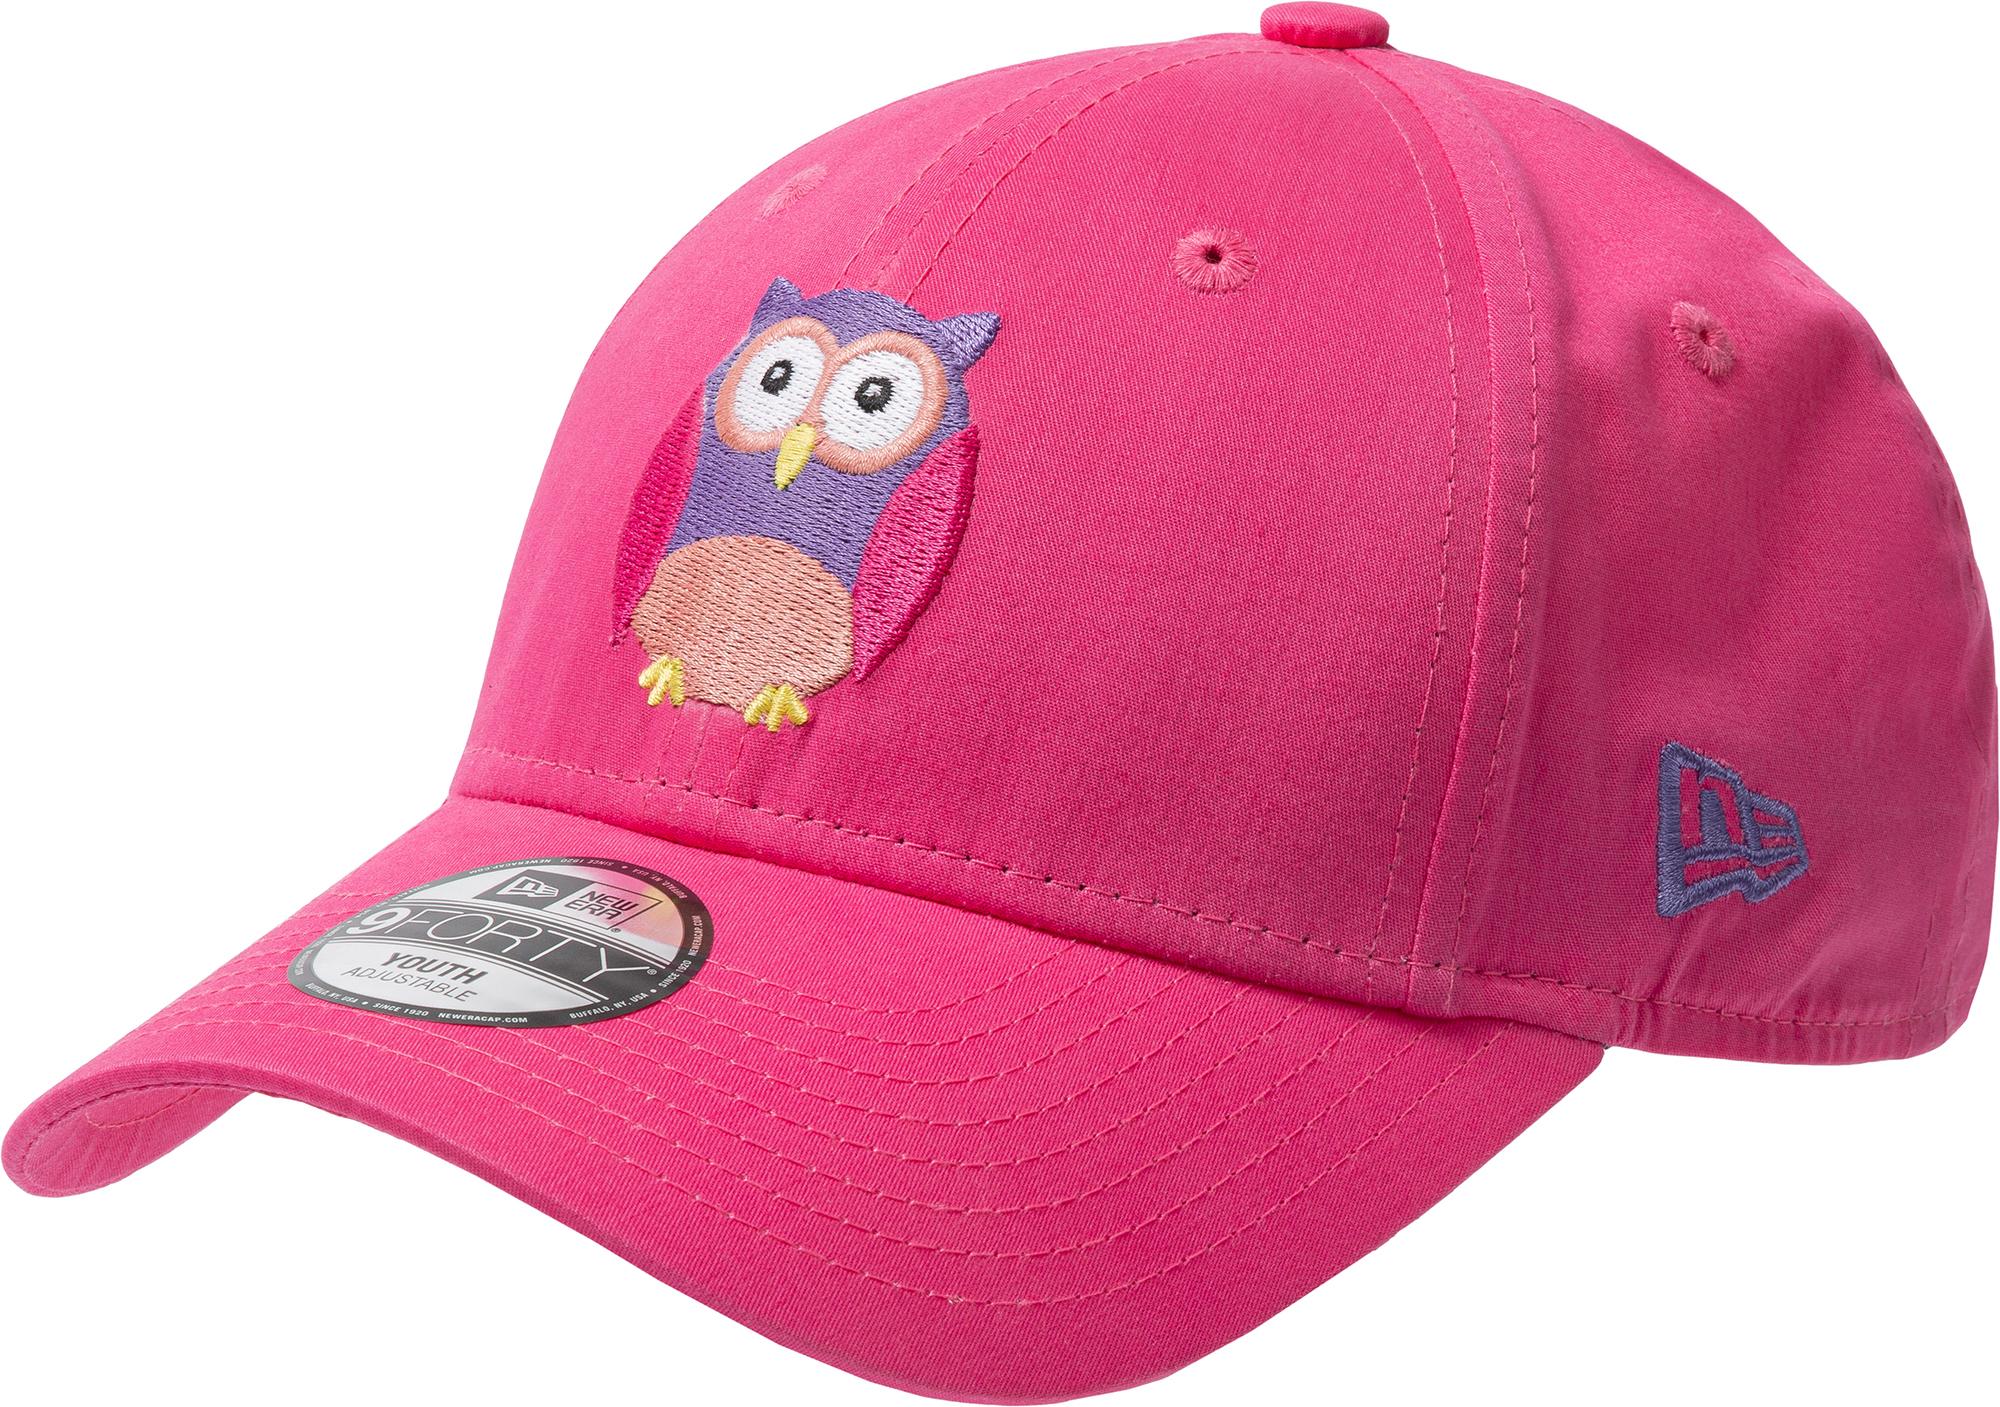 New Era Бейсболка для девочек New Era OWL 940, размер 54-55 new era бейсболка для девочек new era butterfly 940 размер 54 55